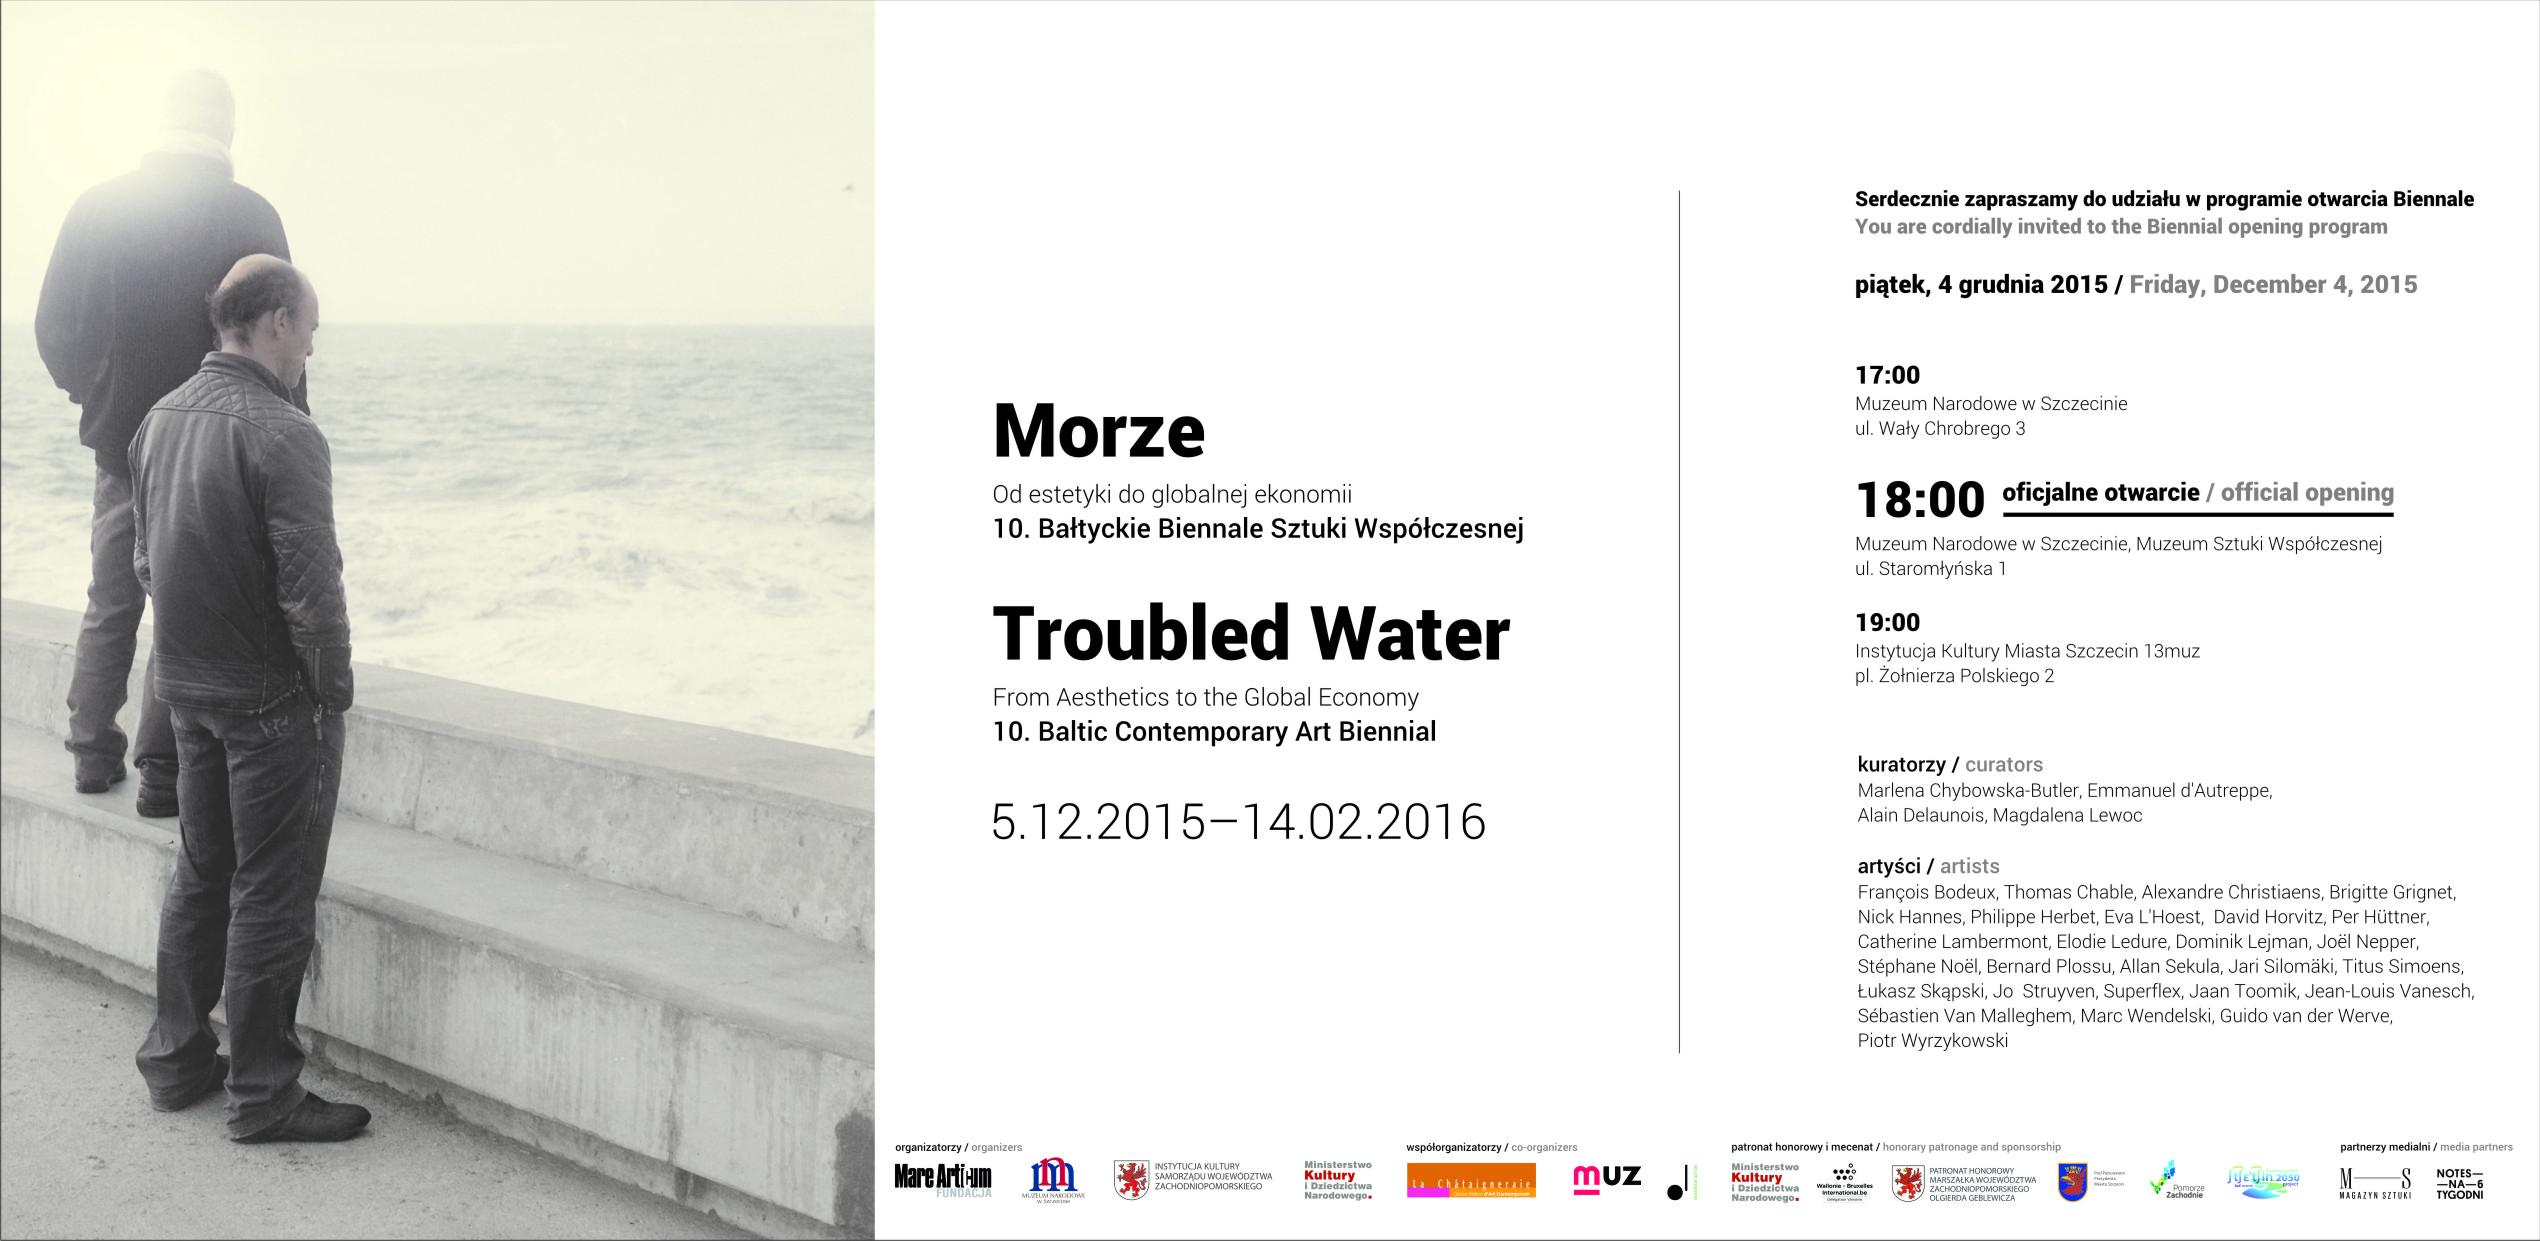 zaproszenie Morze. Troubled Water